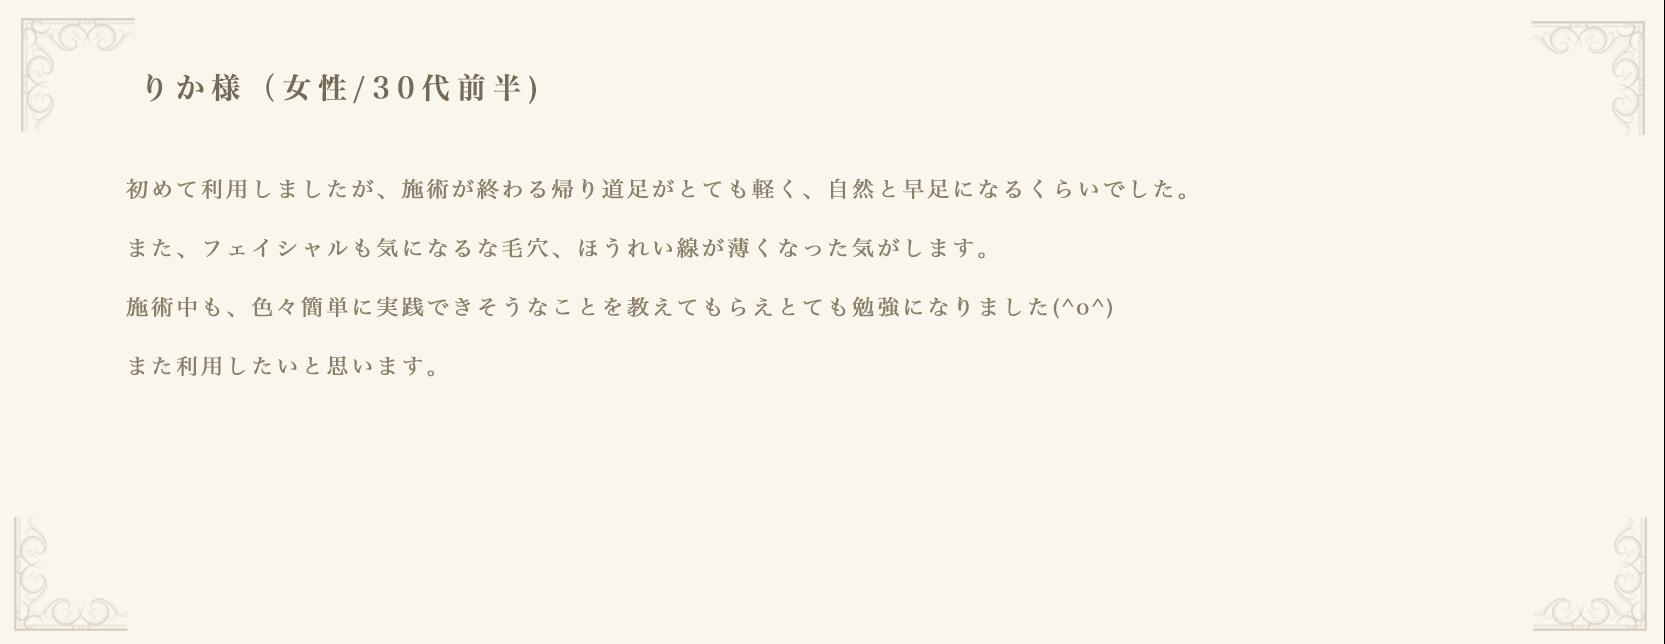 voice - メニュー